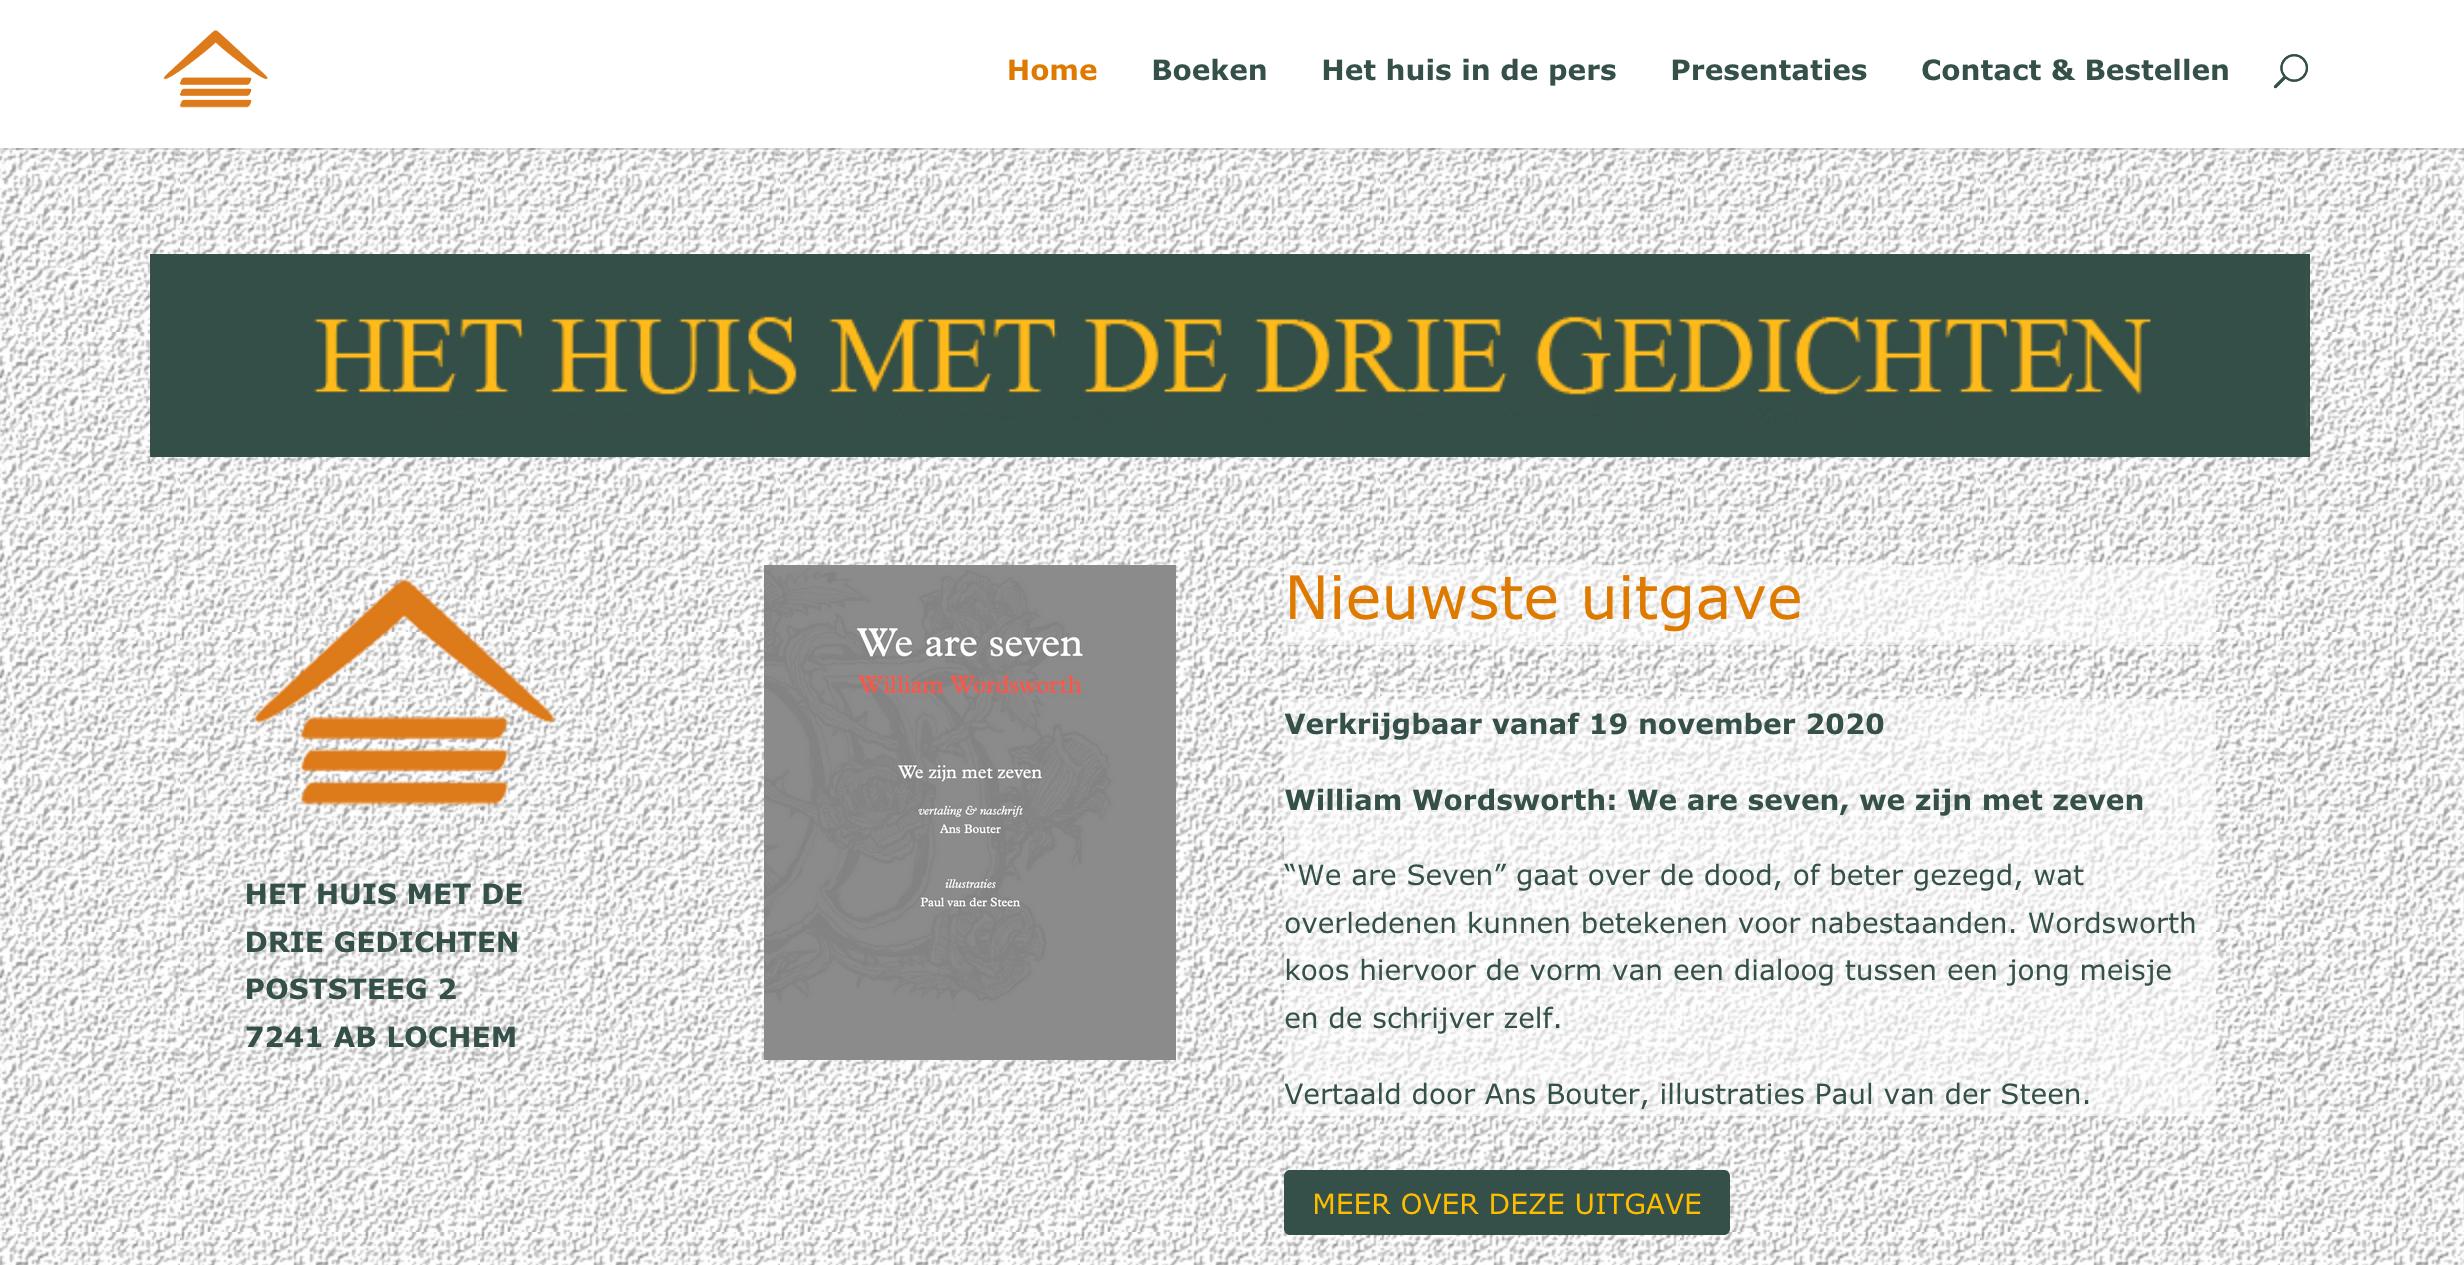 Website huismetdedriegedichten.nl